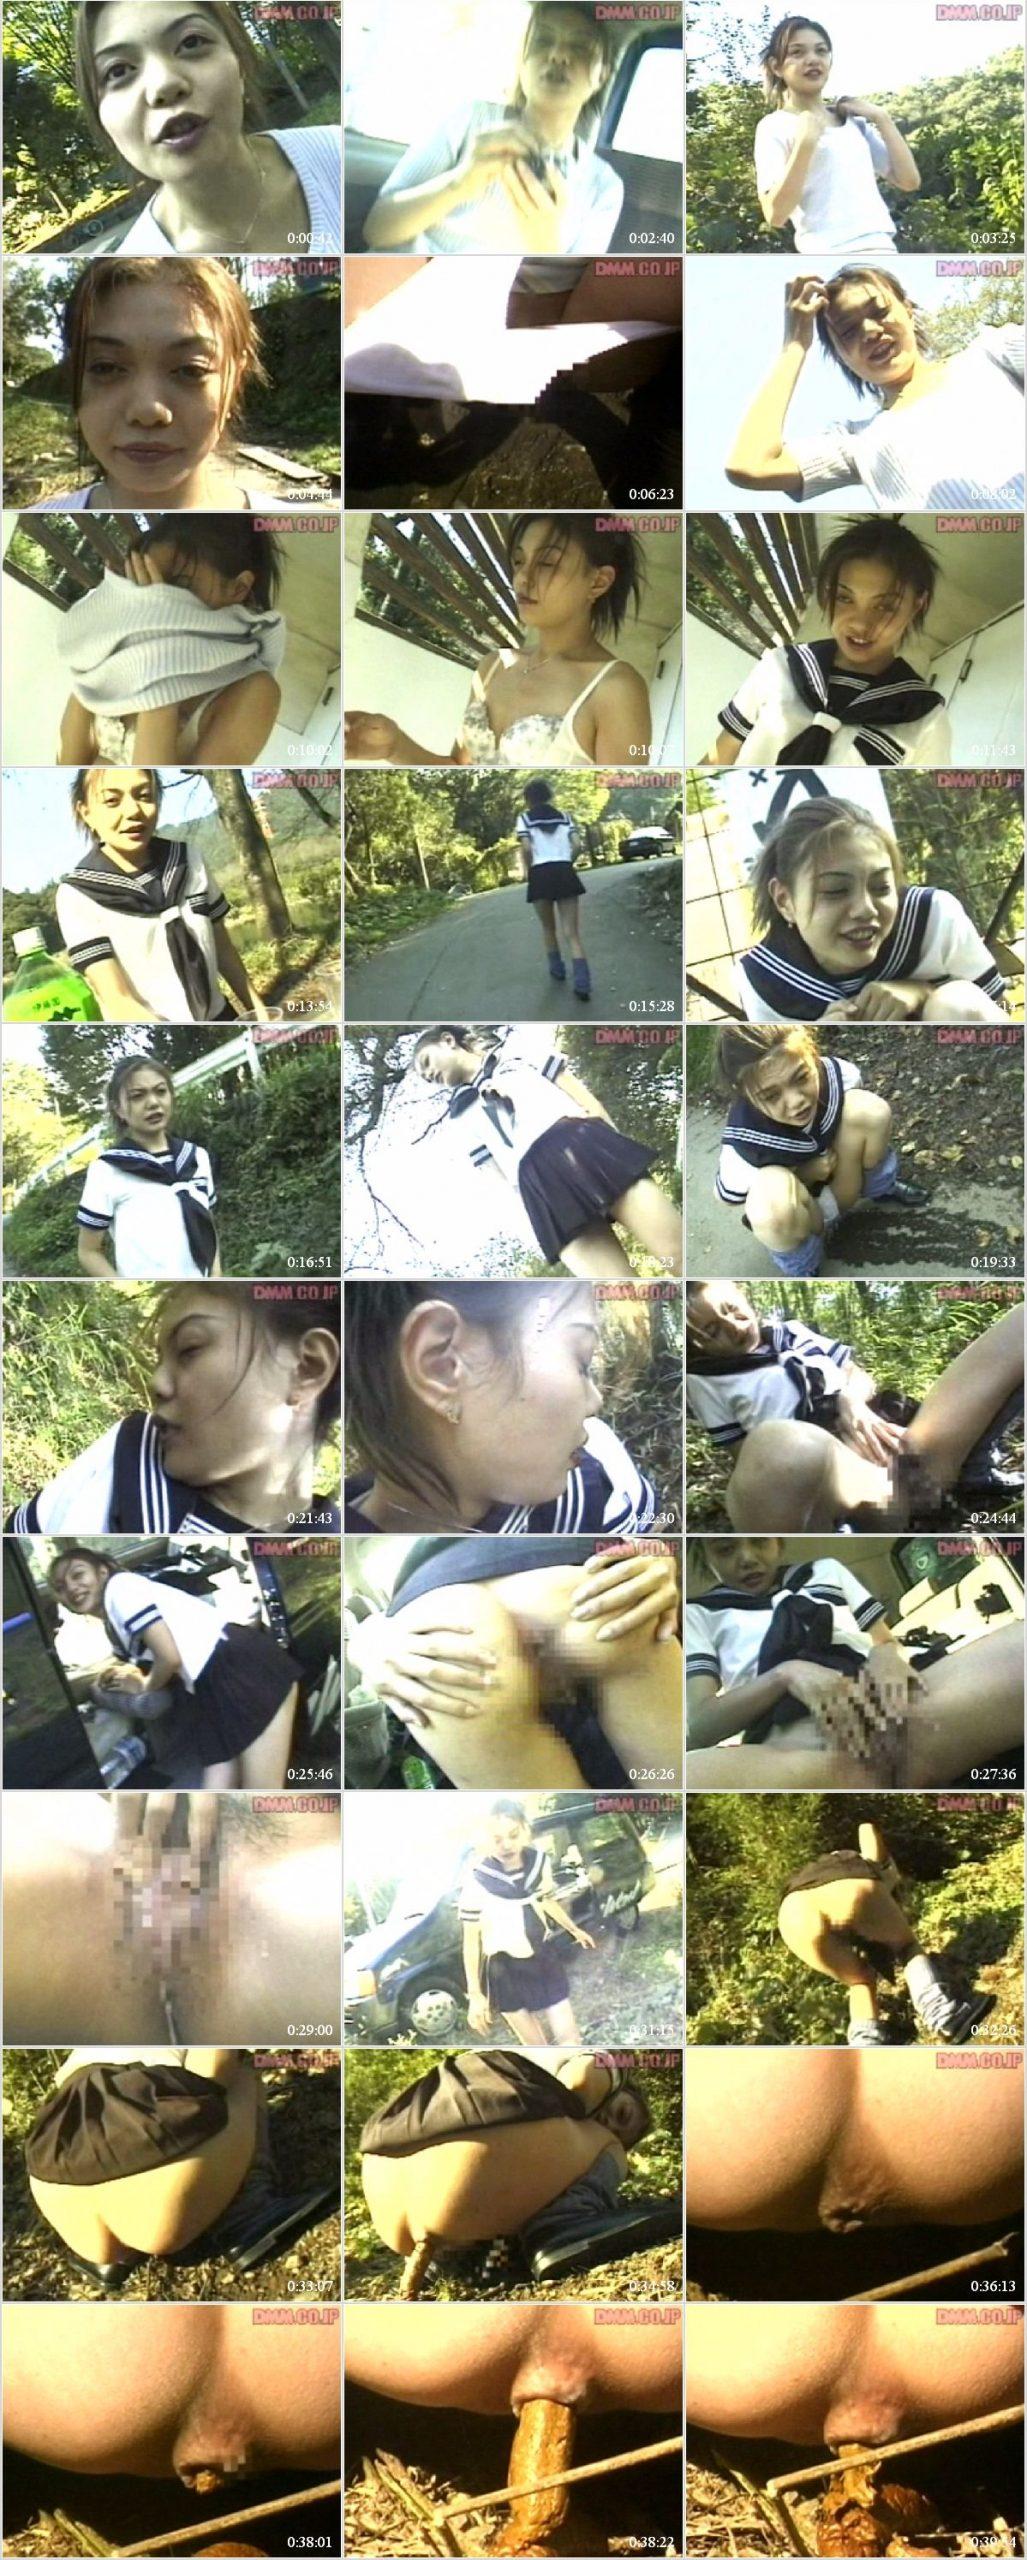 YZE 03 t scaled - [YZE-03] Defecation. 女子高生ヨーコはおもらし、屋外でうんち。